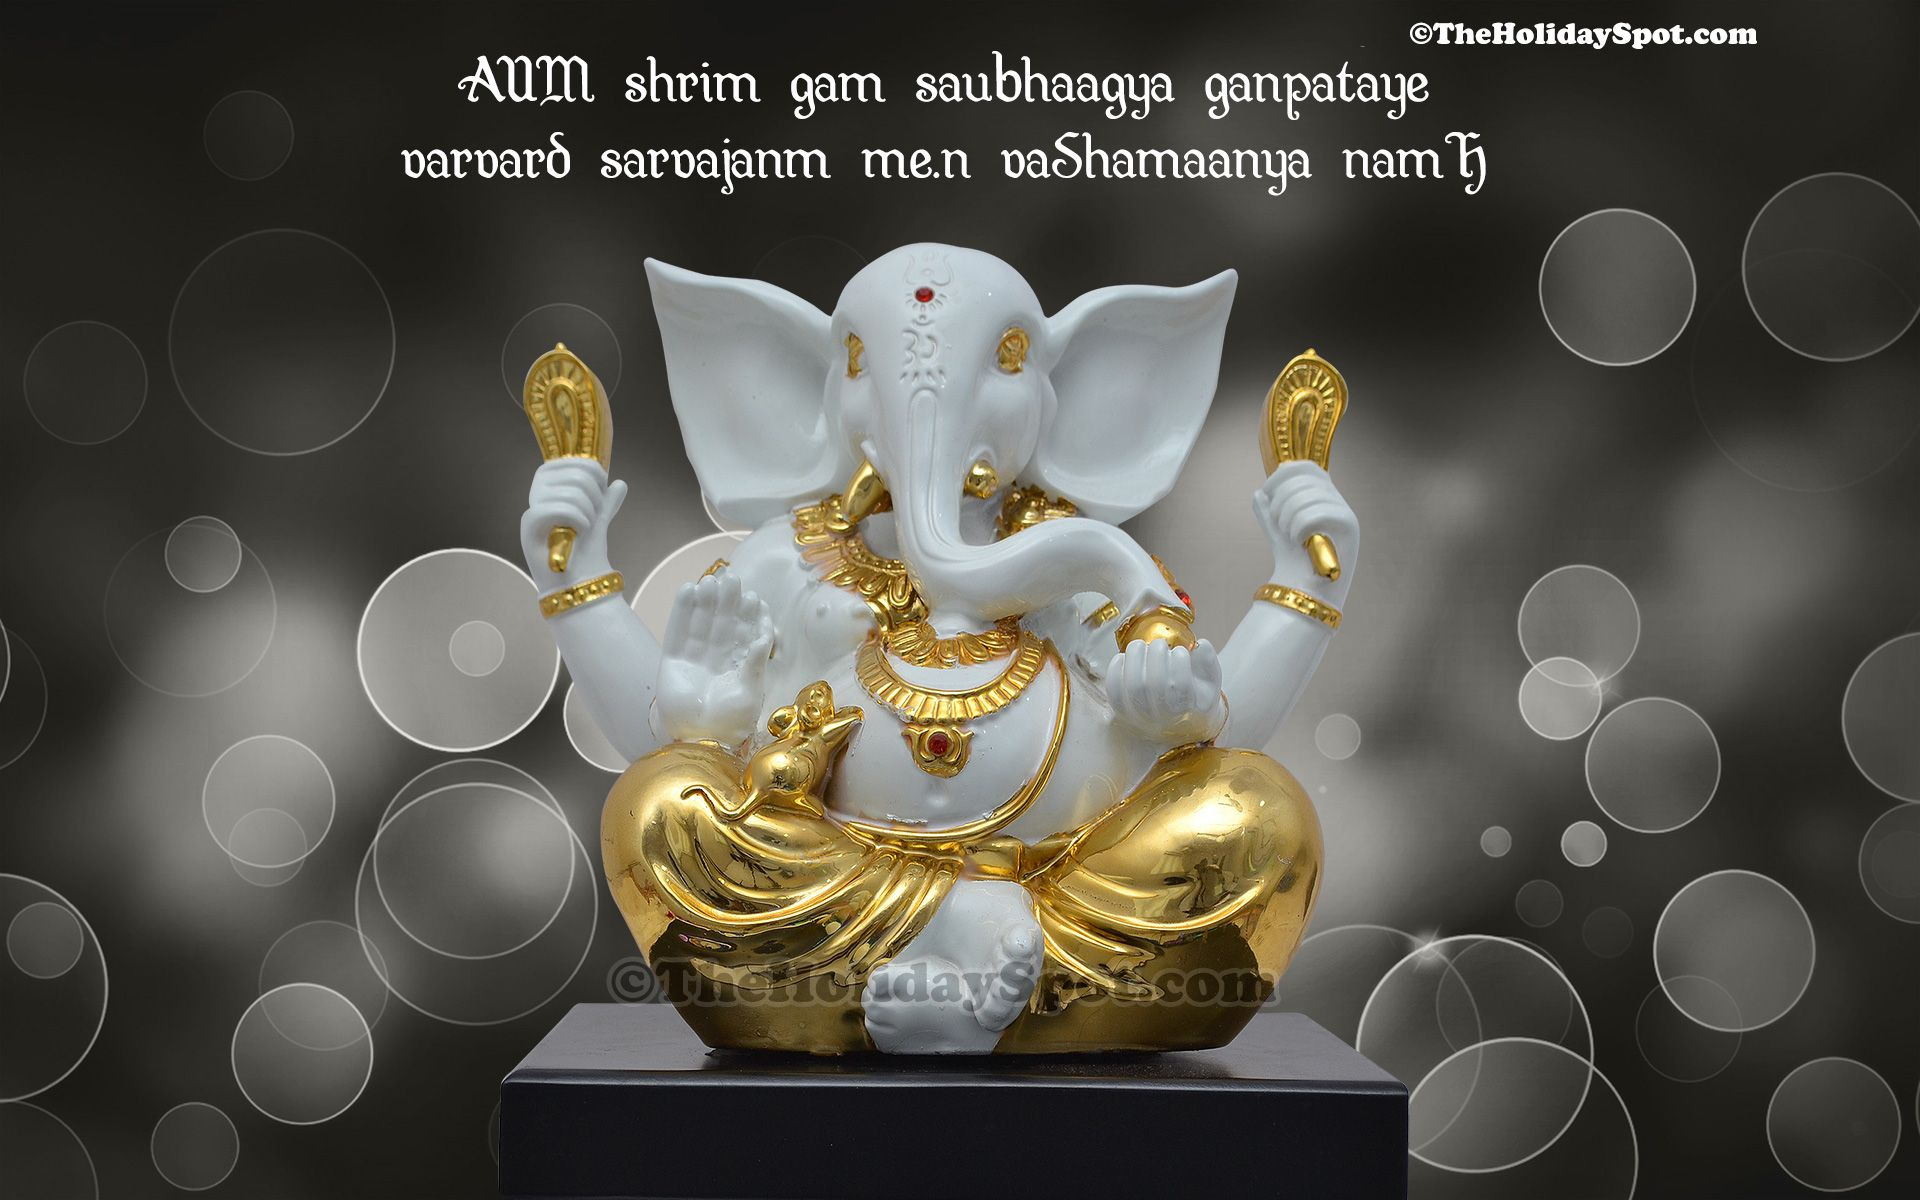 Ganesha Wallpaper Free Desktop Hd Ipad Iphone Wallpapers Ganesh Wallpaper Ganesh Wallpaper